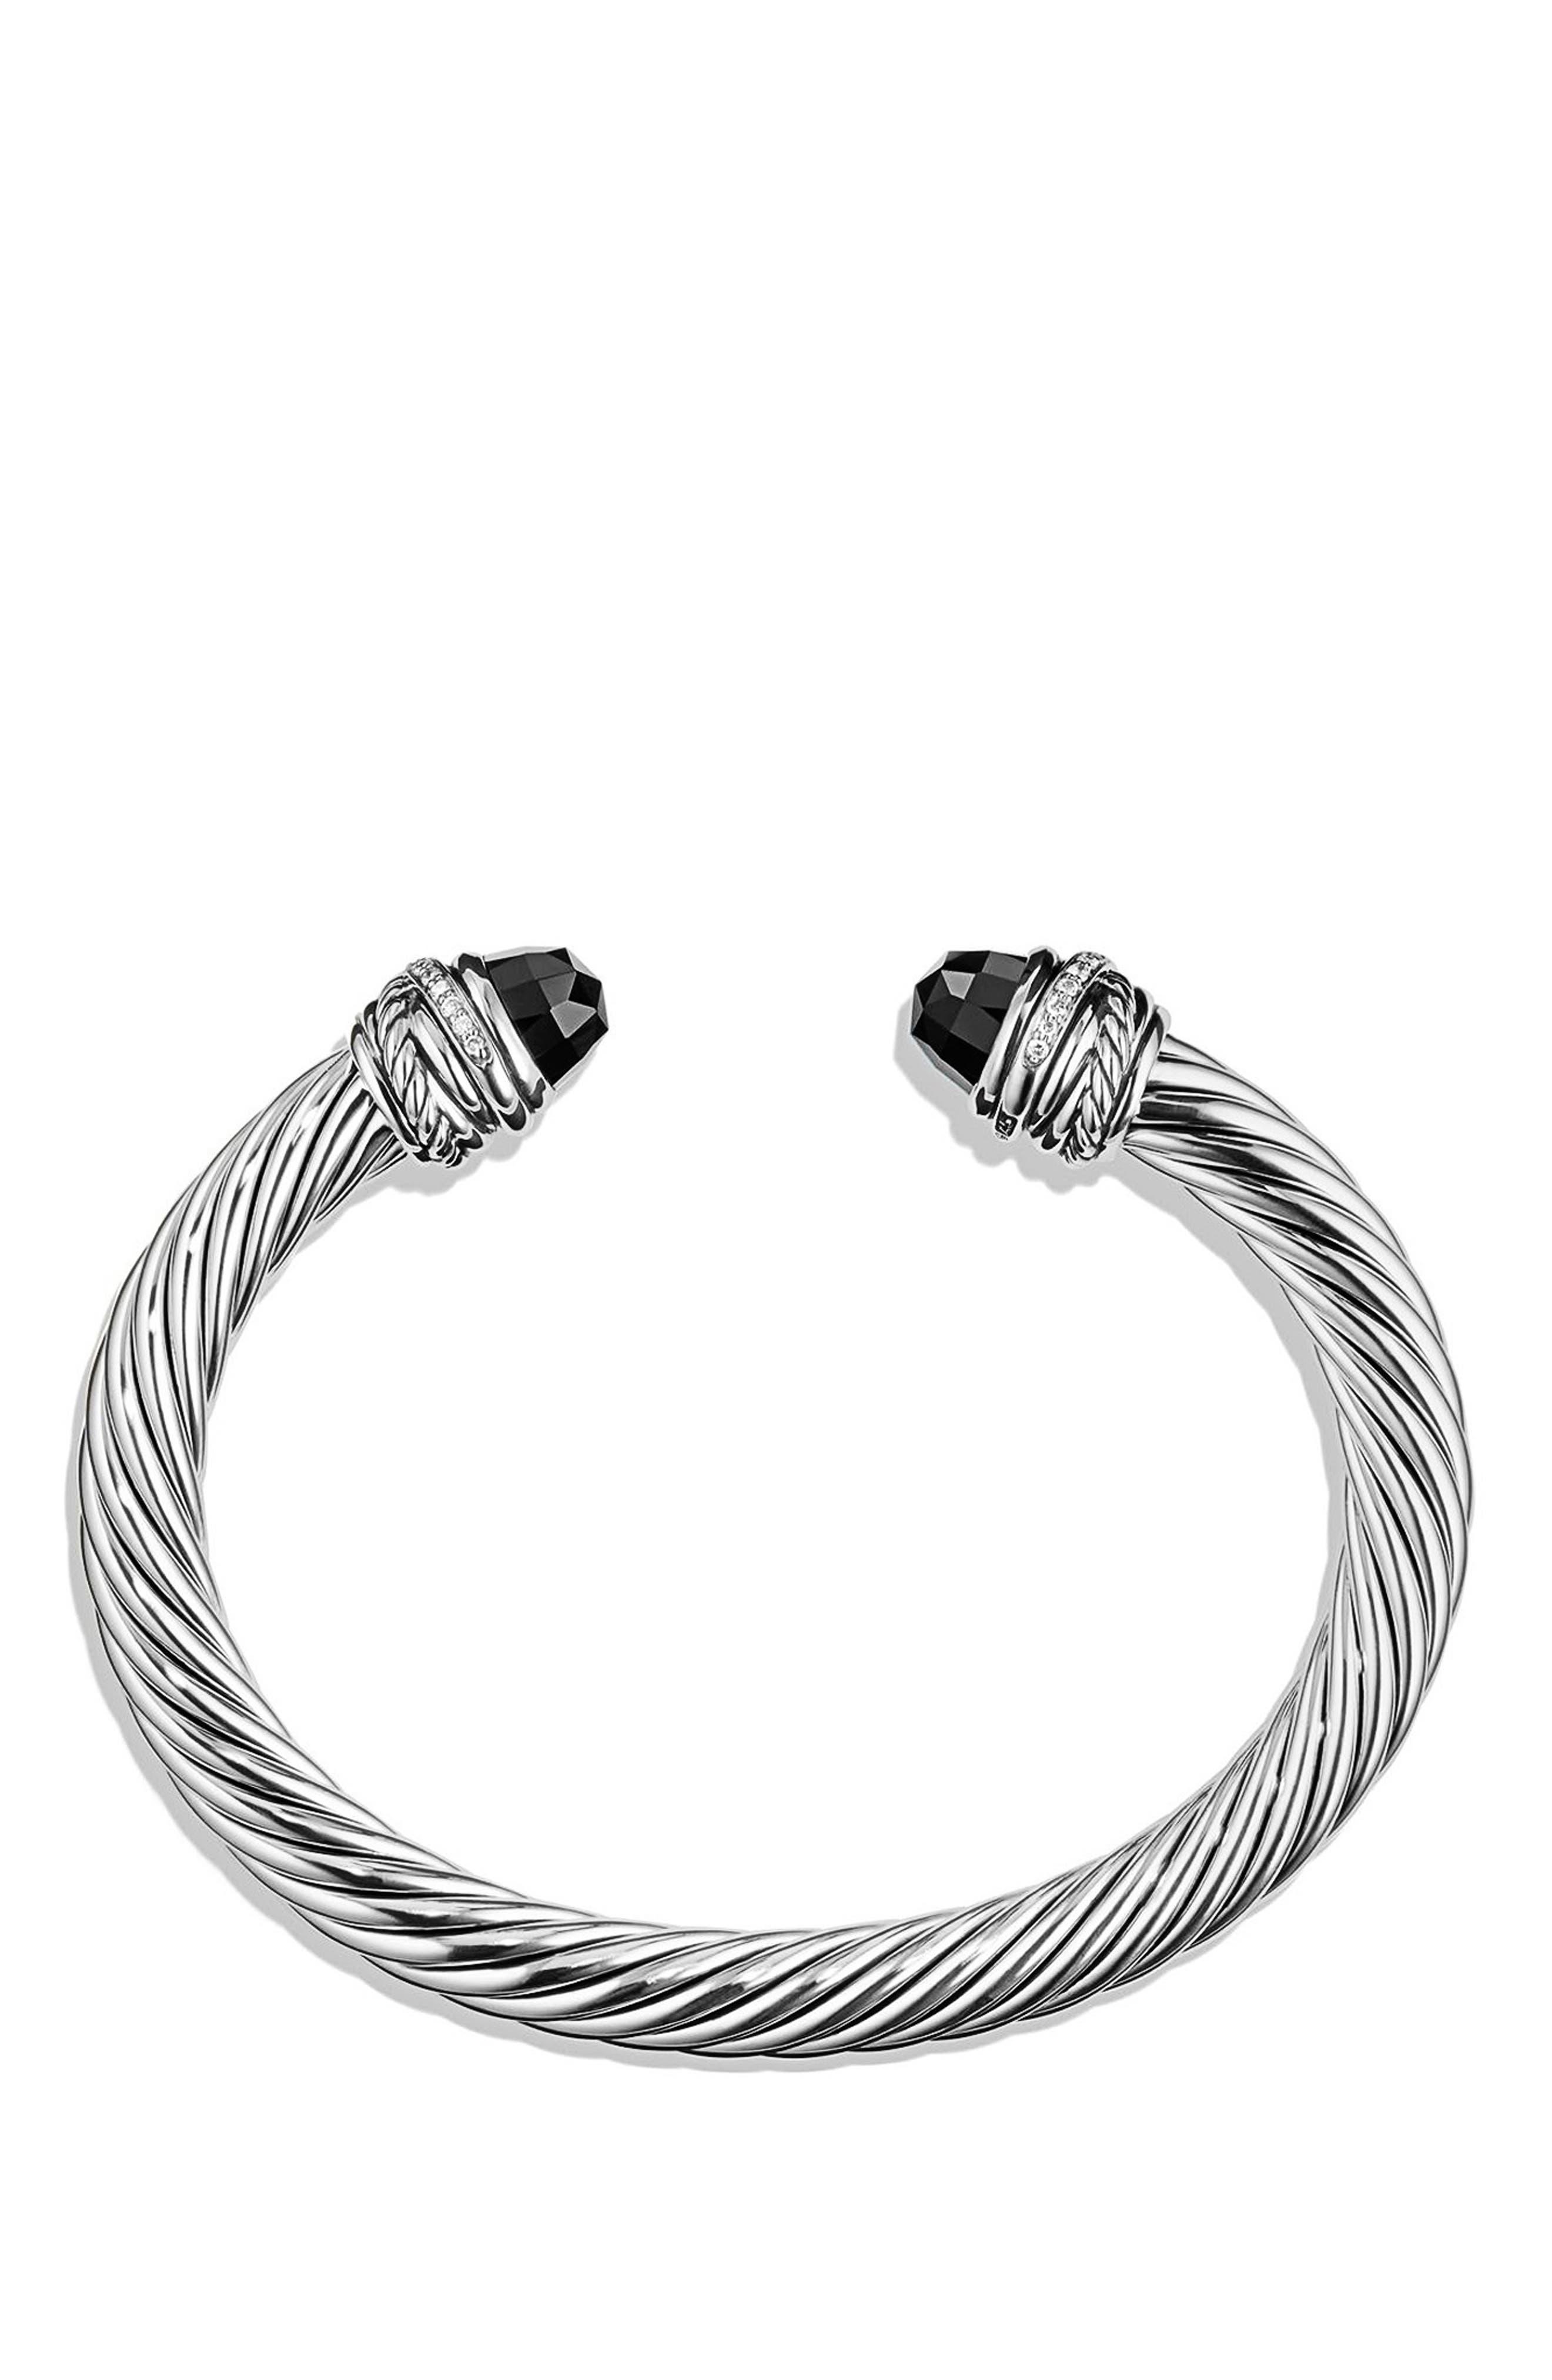 DAVID YURMAN, Crossover Bracelet with Diamonds, 7mm, Alternate thumbnail 2, color, BLACK ONYX